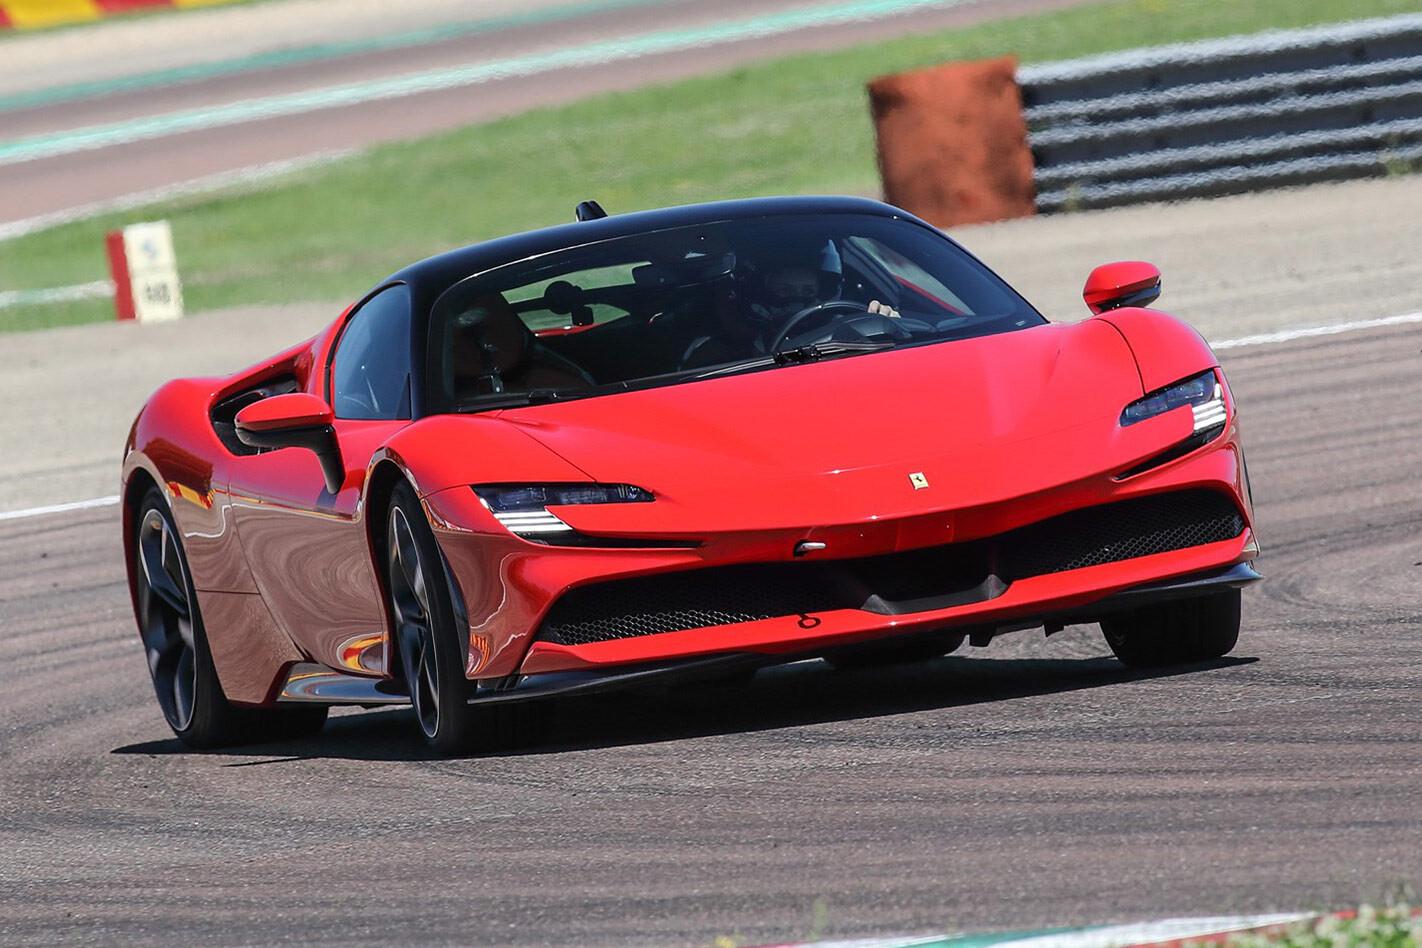 2020 Ferrari SF90 Stradale